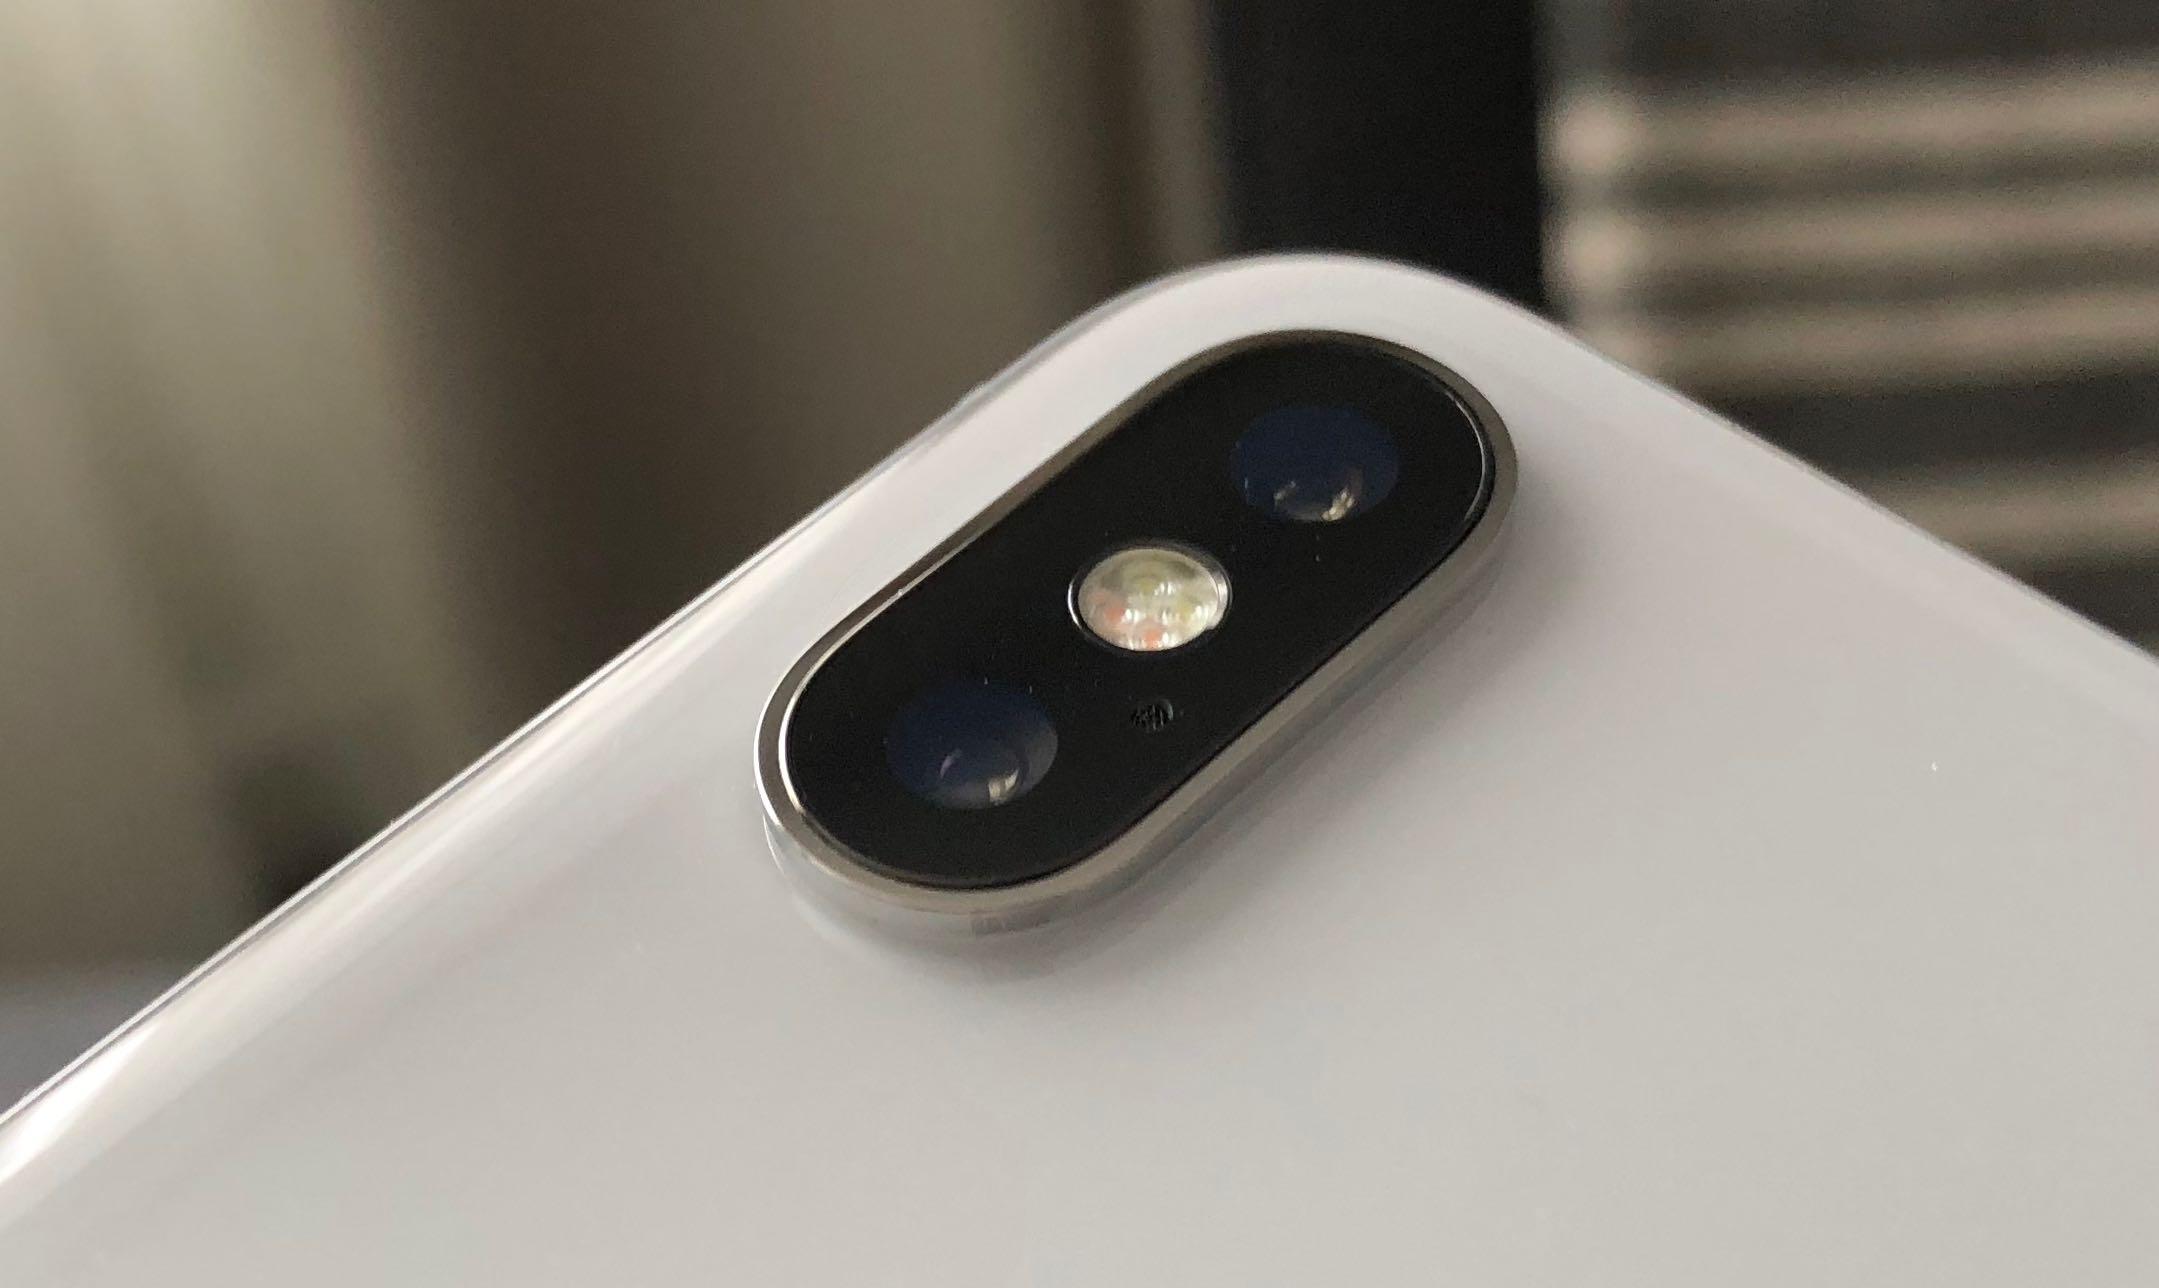 A closeup of the camera on the iPhone X. CITYNEWS/Winston Sih